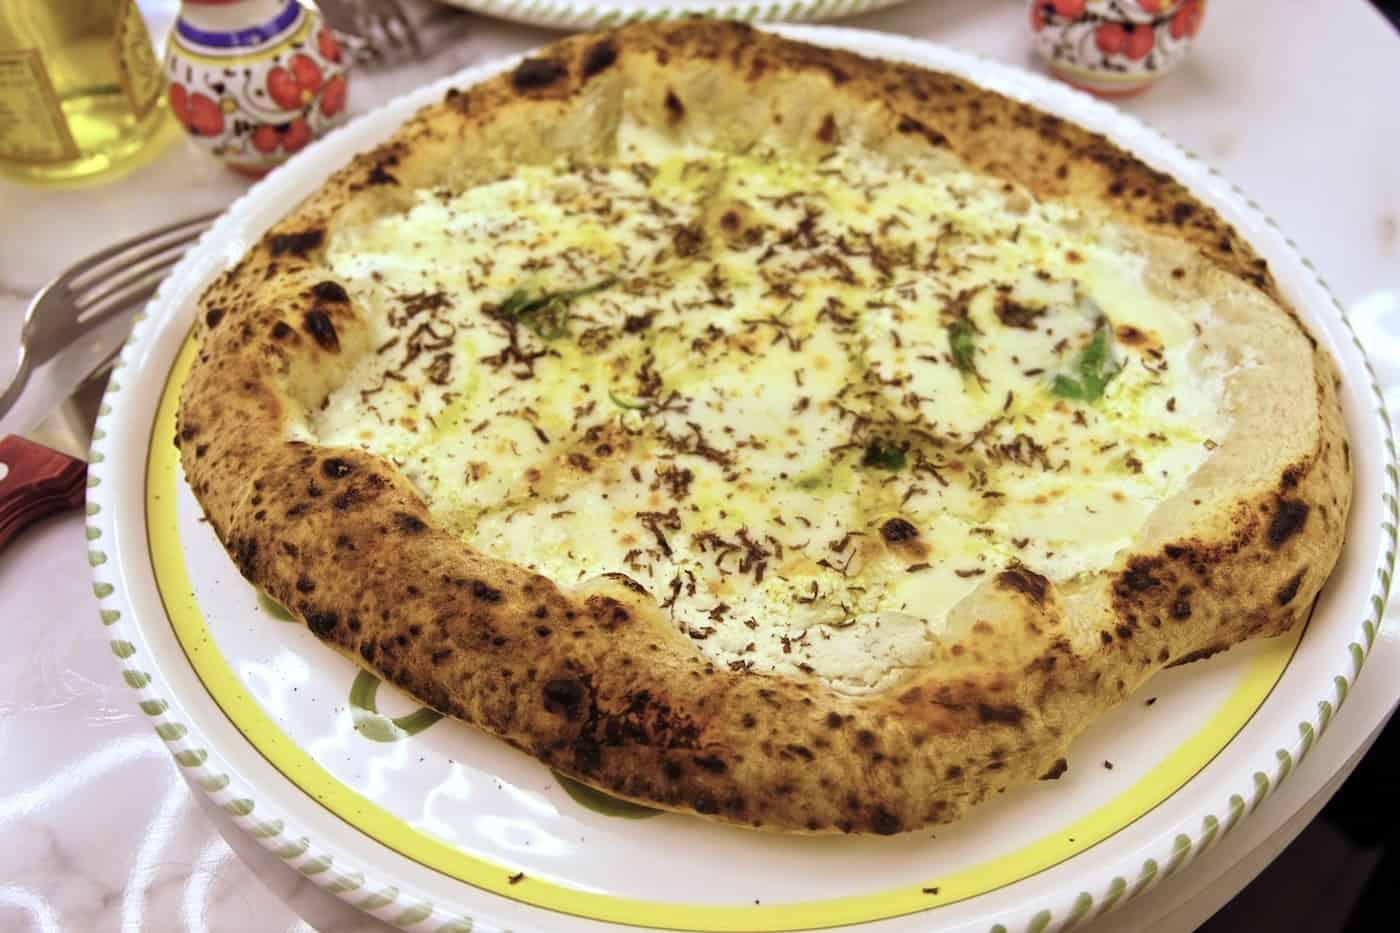 dalmata-pizzeria-rue-tiquetonne-paris-2eme